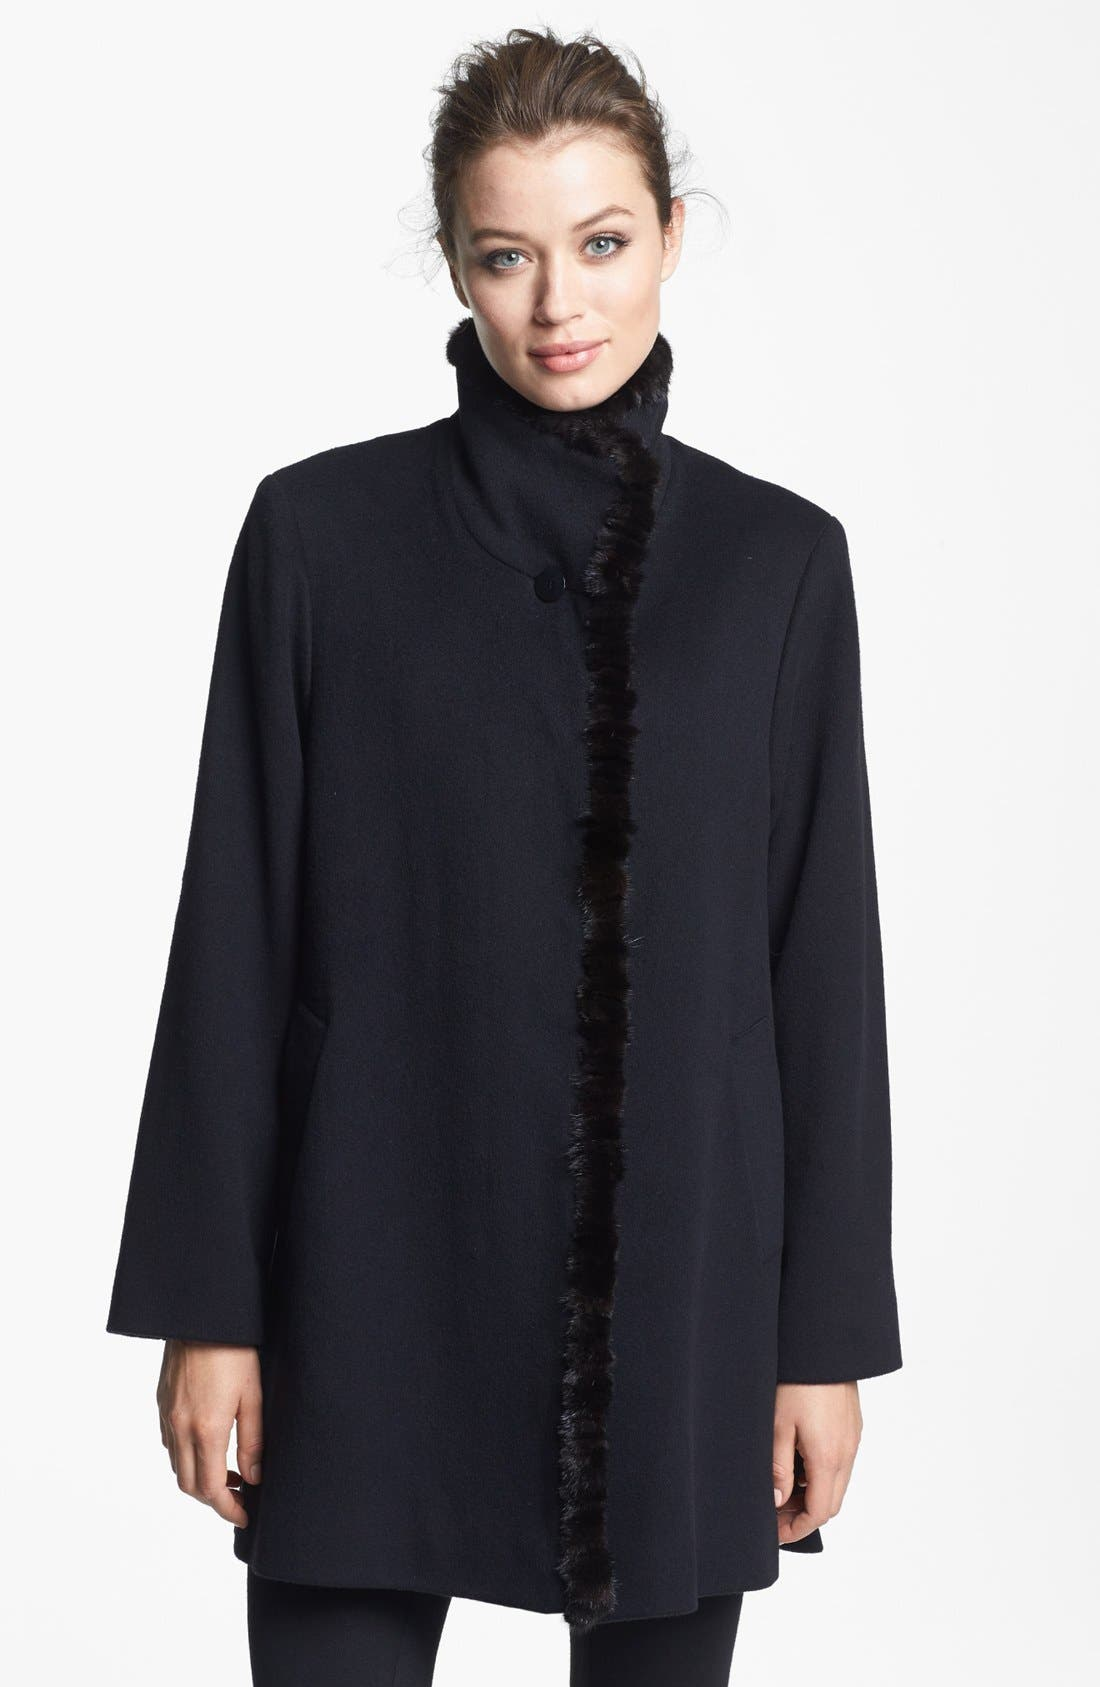 Alternate Image 1 Selected - Fleurette Genuine Mink Fur Trim Loro Piana Wool Coat (Petite)